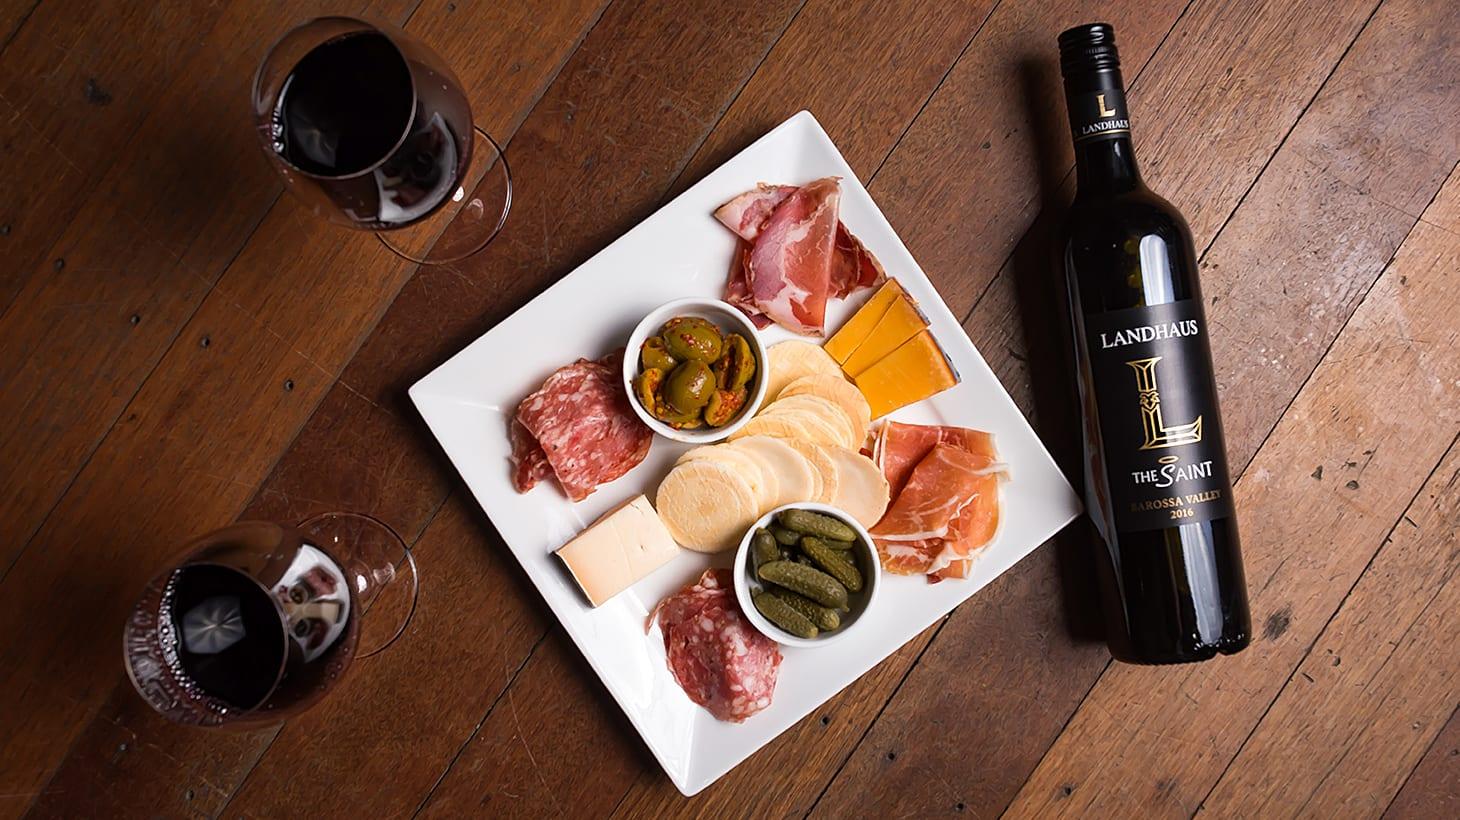 Wine Tasting with Platter and Take-Home Bottle - Landhaus Wine Estate